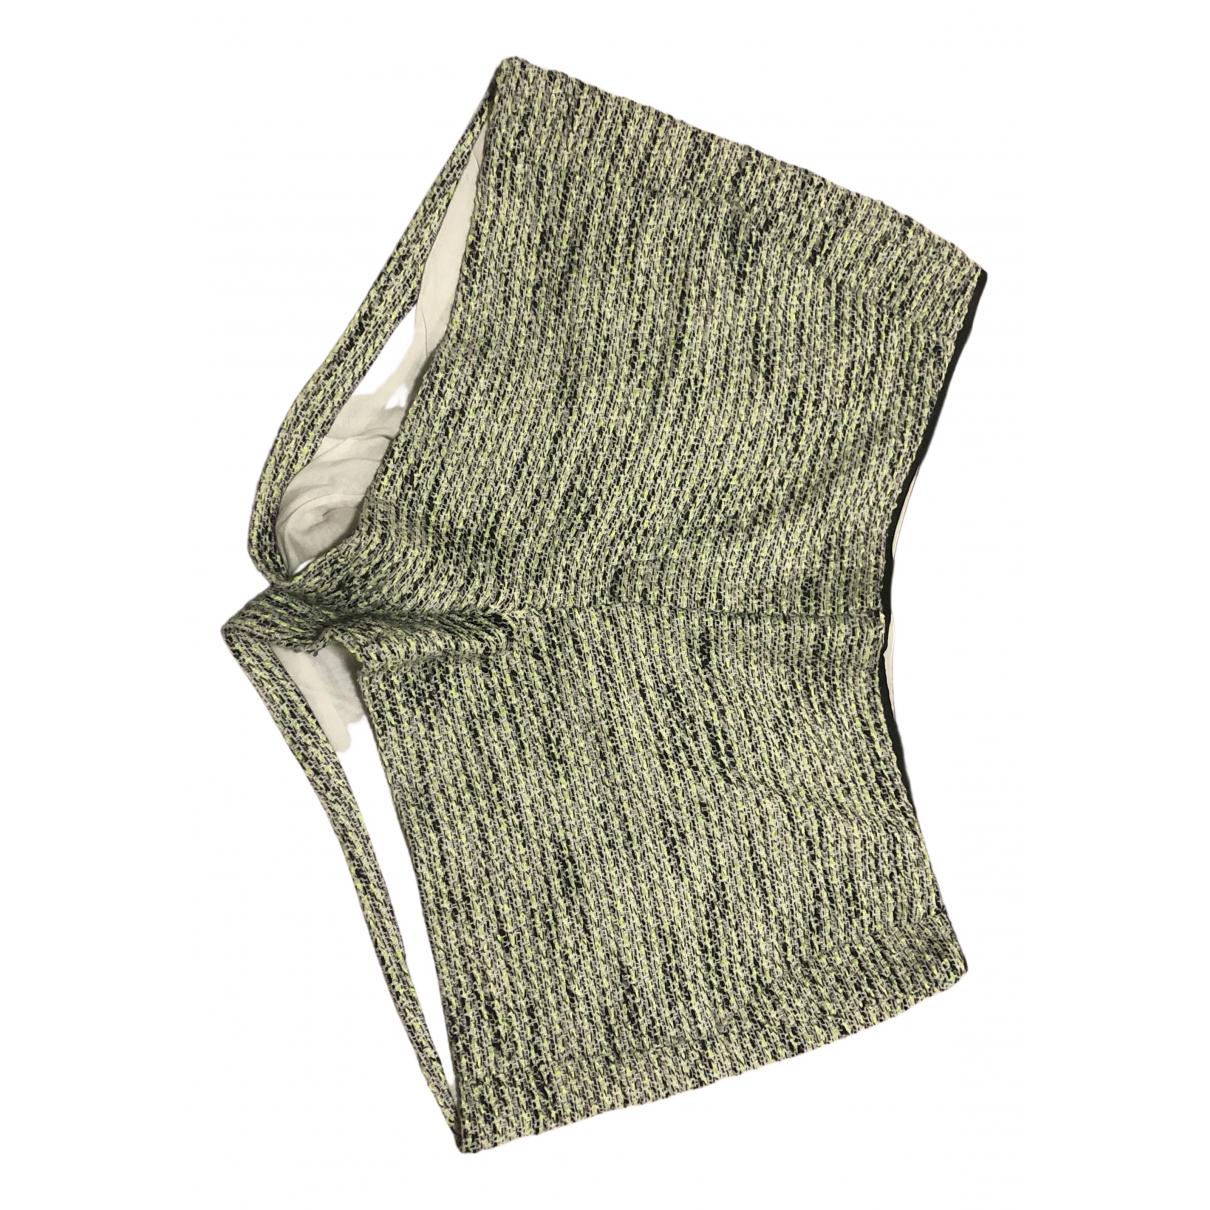 Sandro N Green Tweed Shorts for Women 40 FR